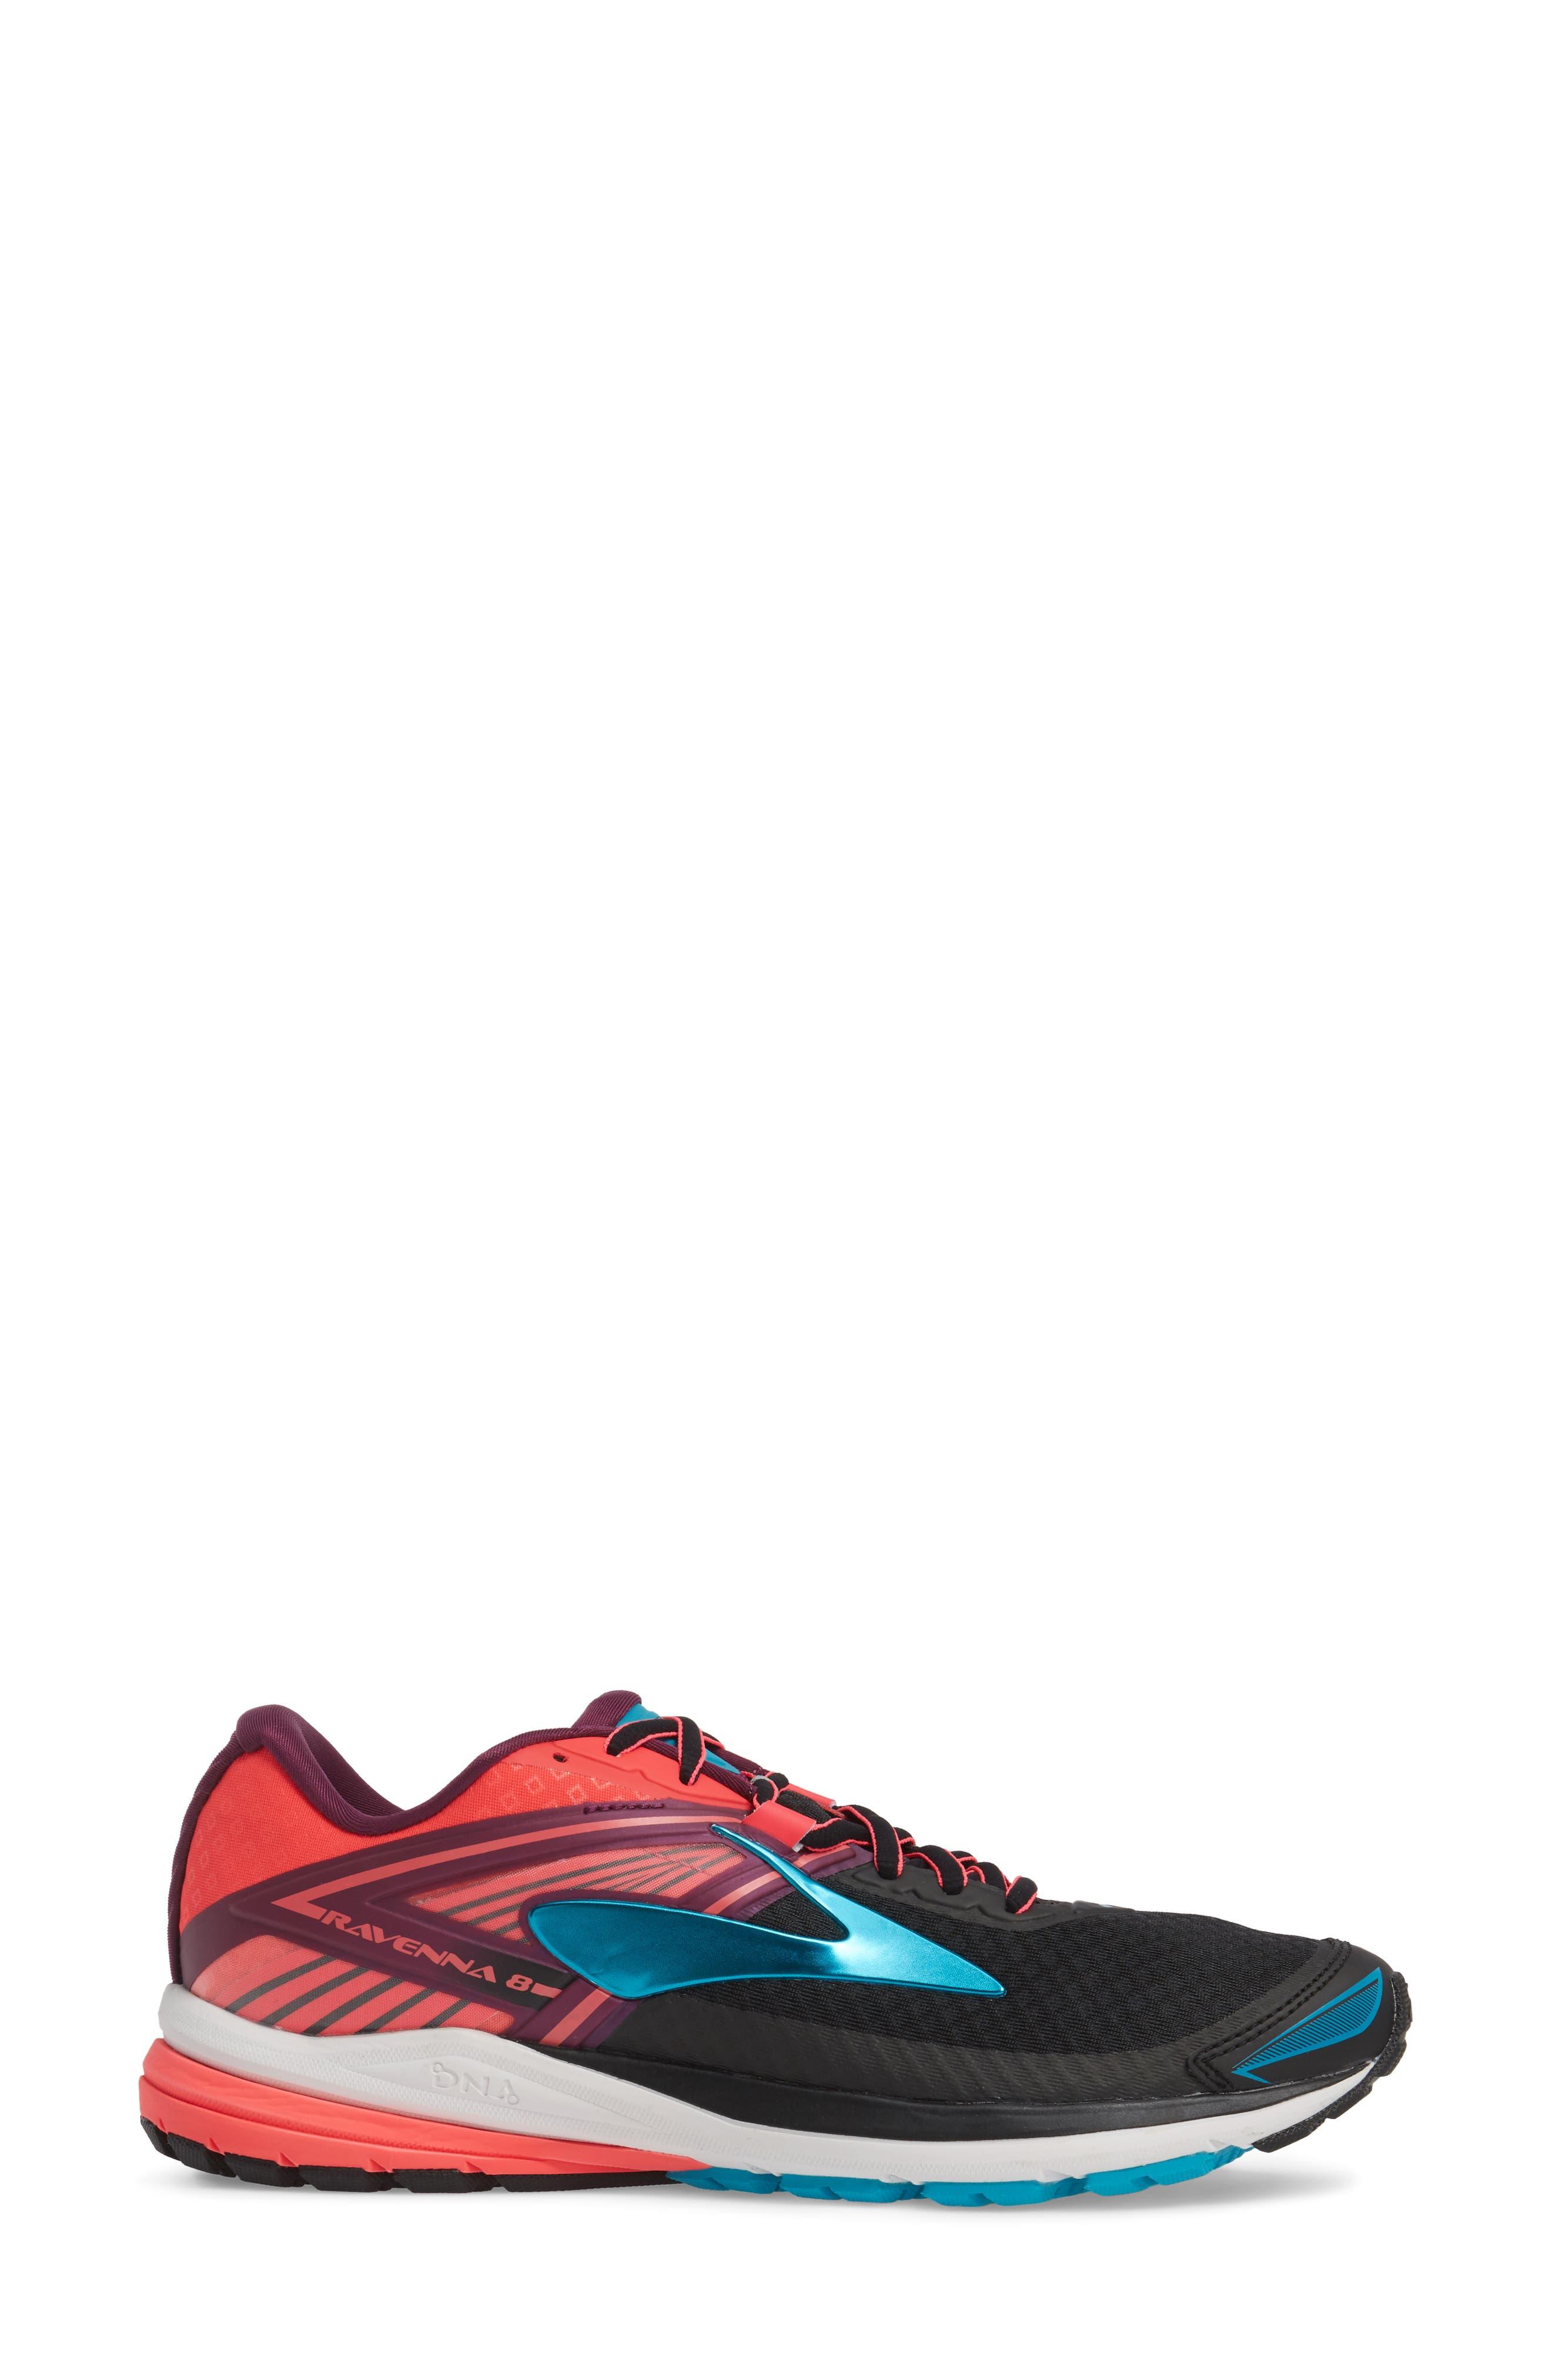 Ravenna 8 Running Shoe,                             Alternate thumbnail 3, color,                             013